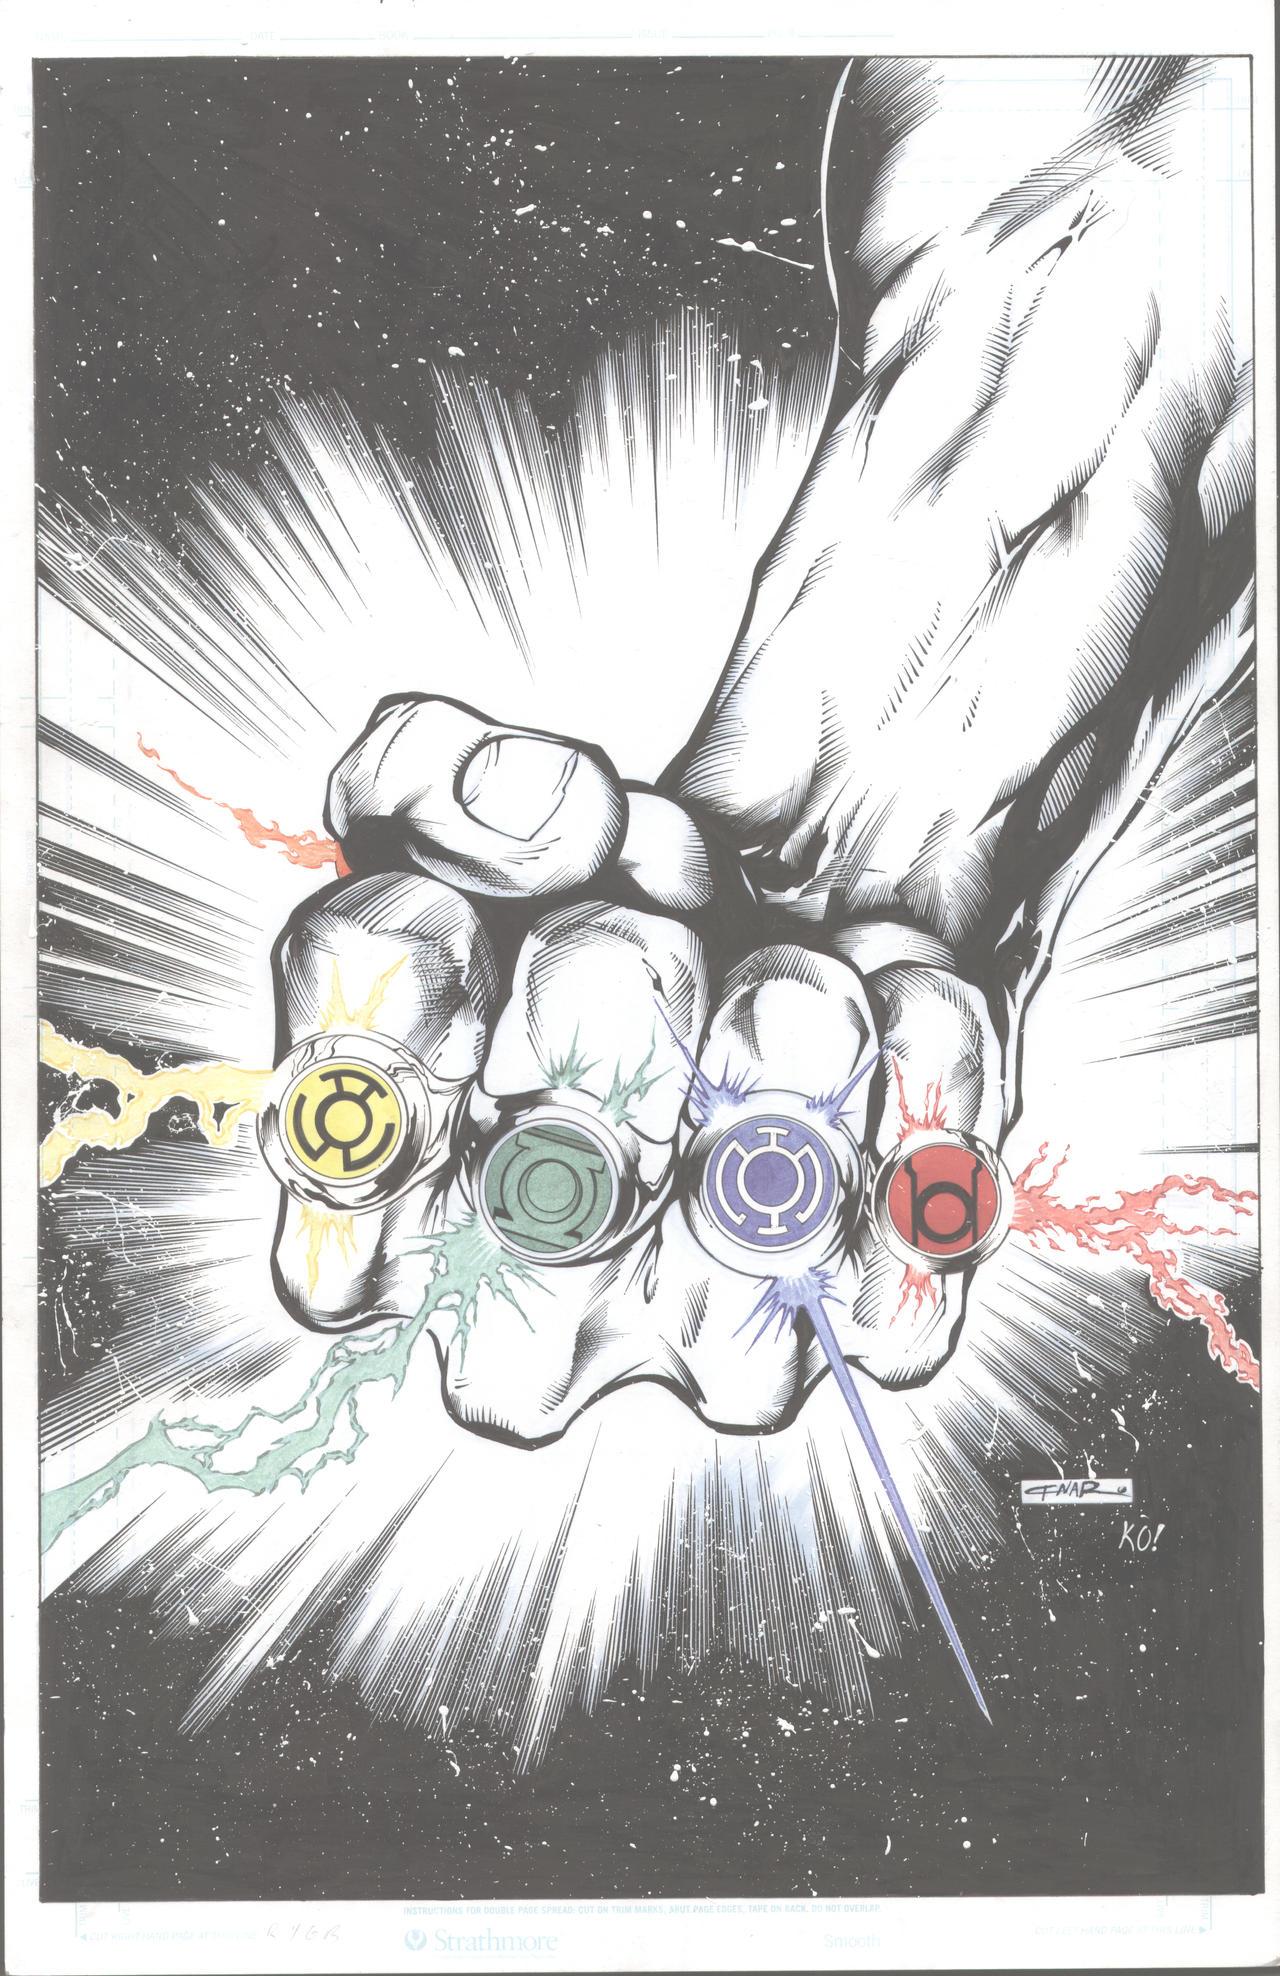 Legion Cover to Blackest night by TonyKordos